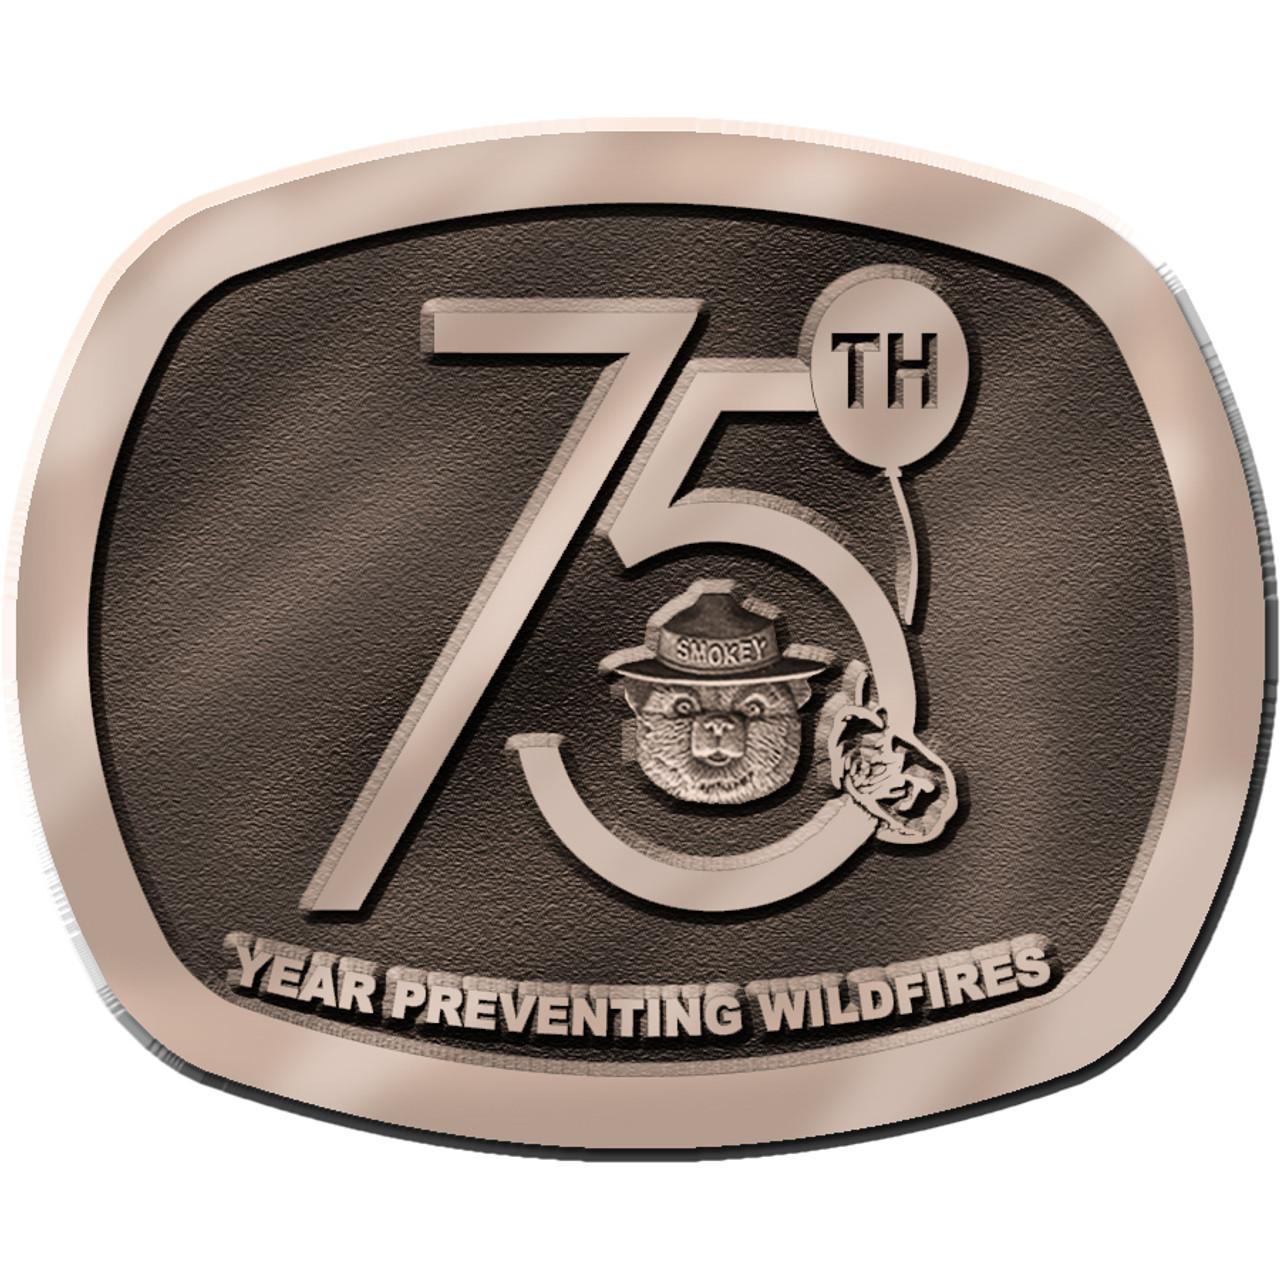 Smokey Bear 75th Anniversary Buckle